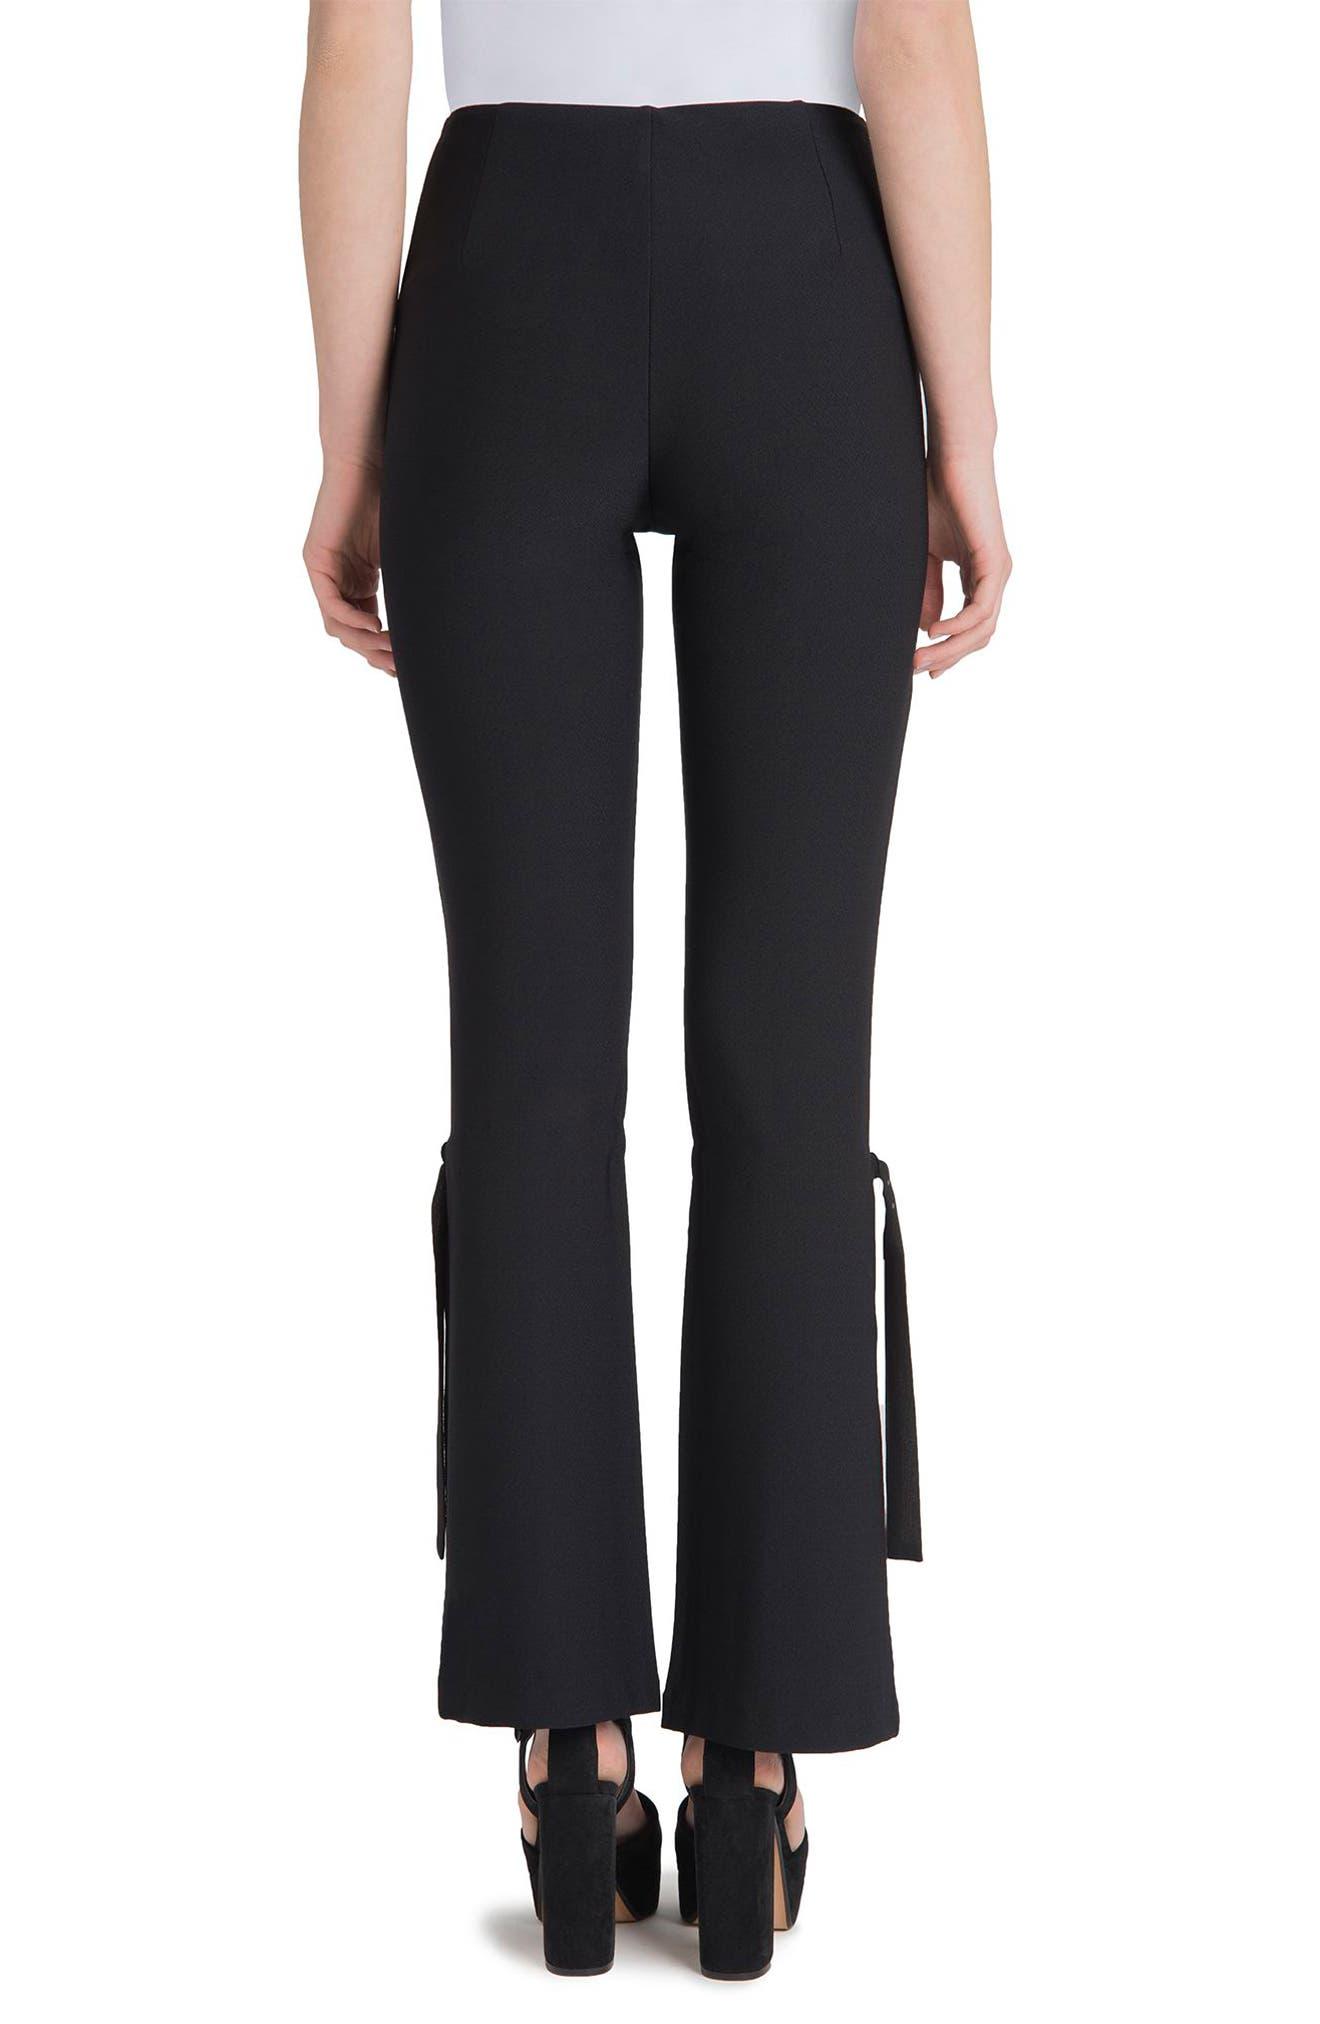 Arcadia High Waist Pants,                             Alternate thumbnail 2, color,                             Black